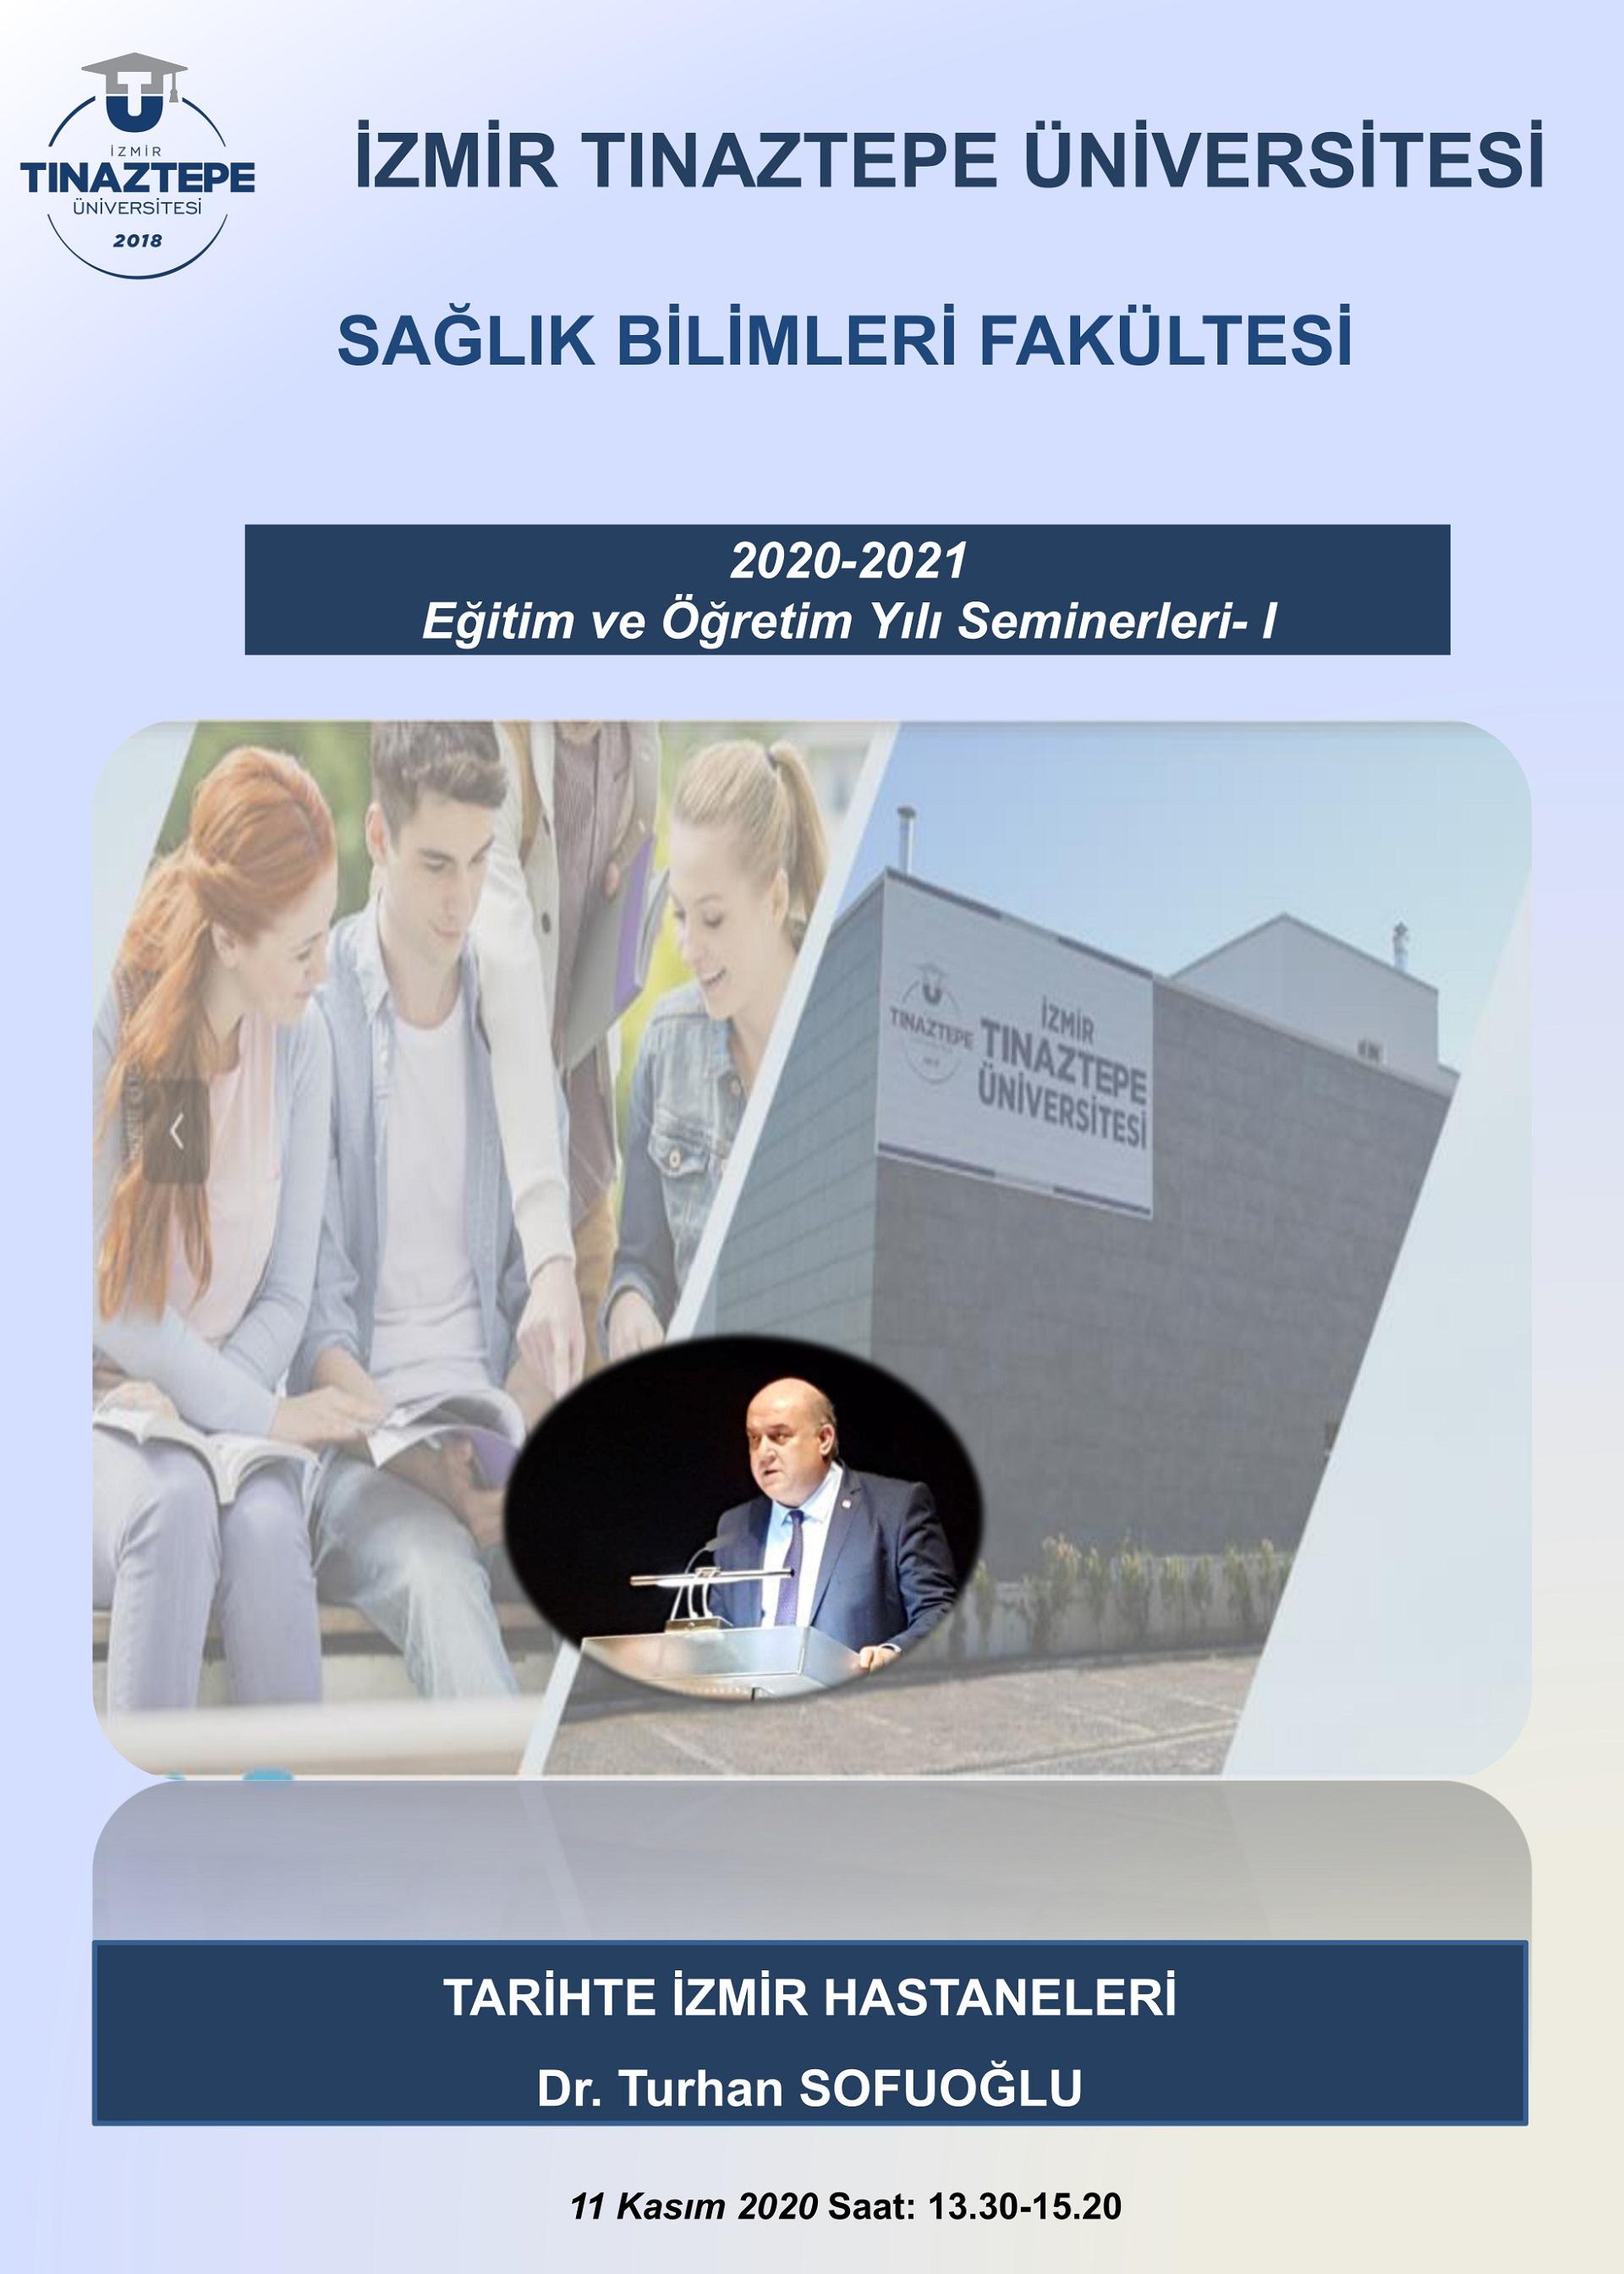 Tarihte İzmir Hastaneleri